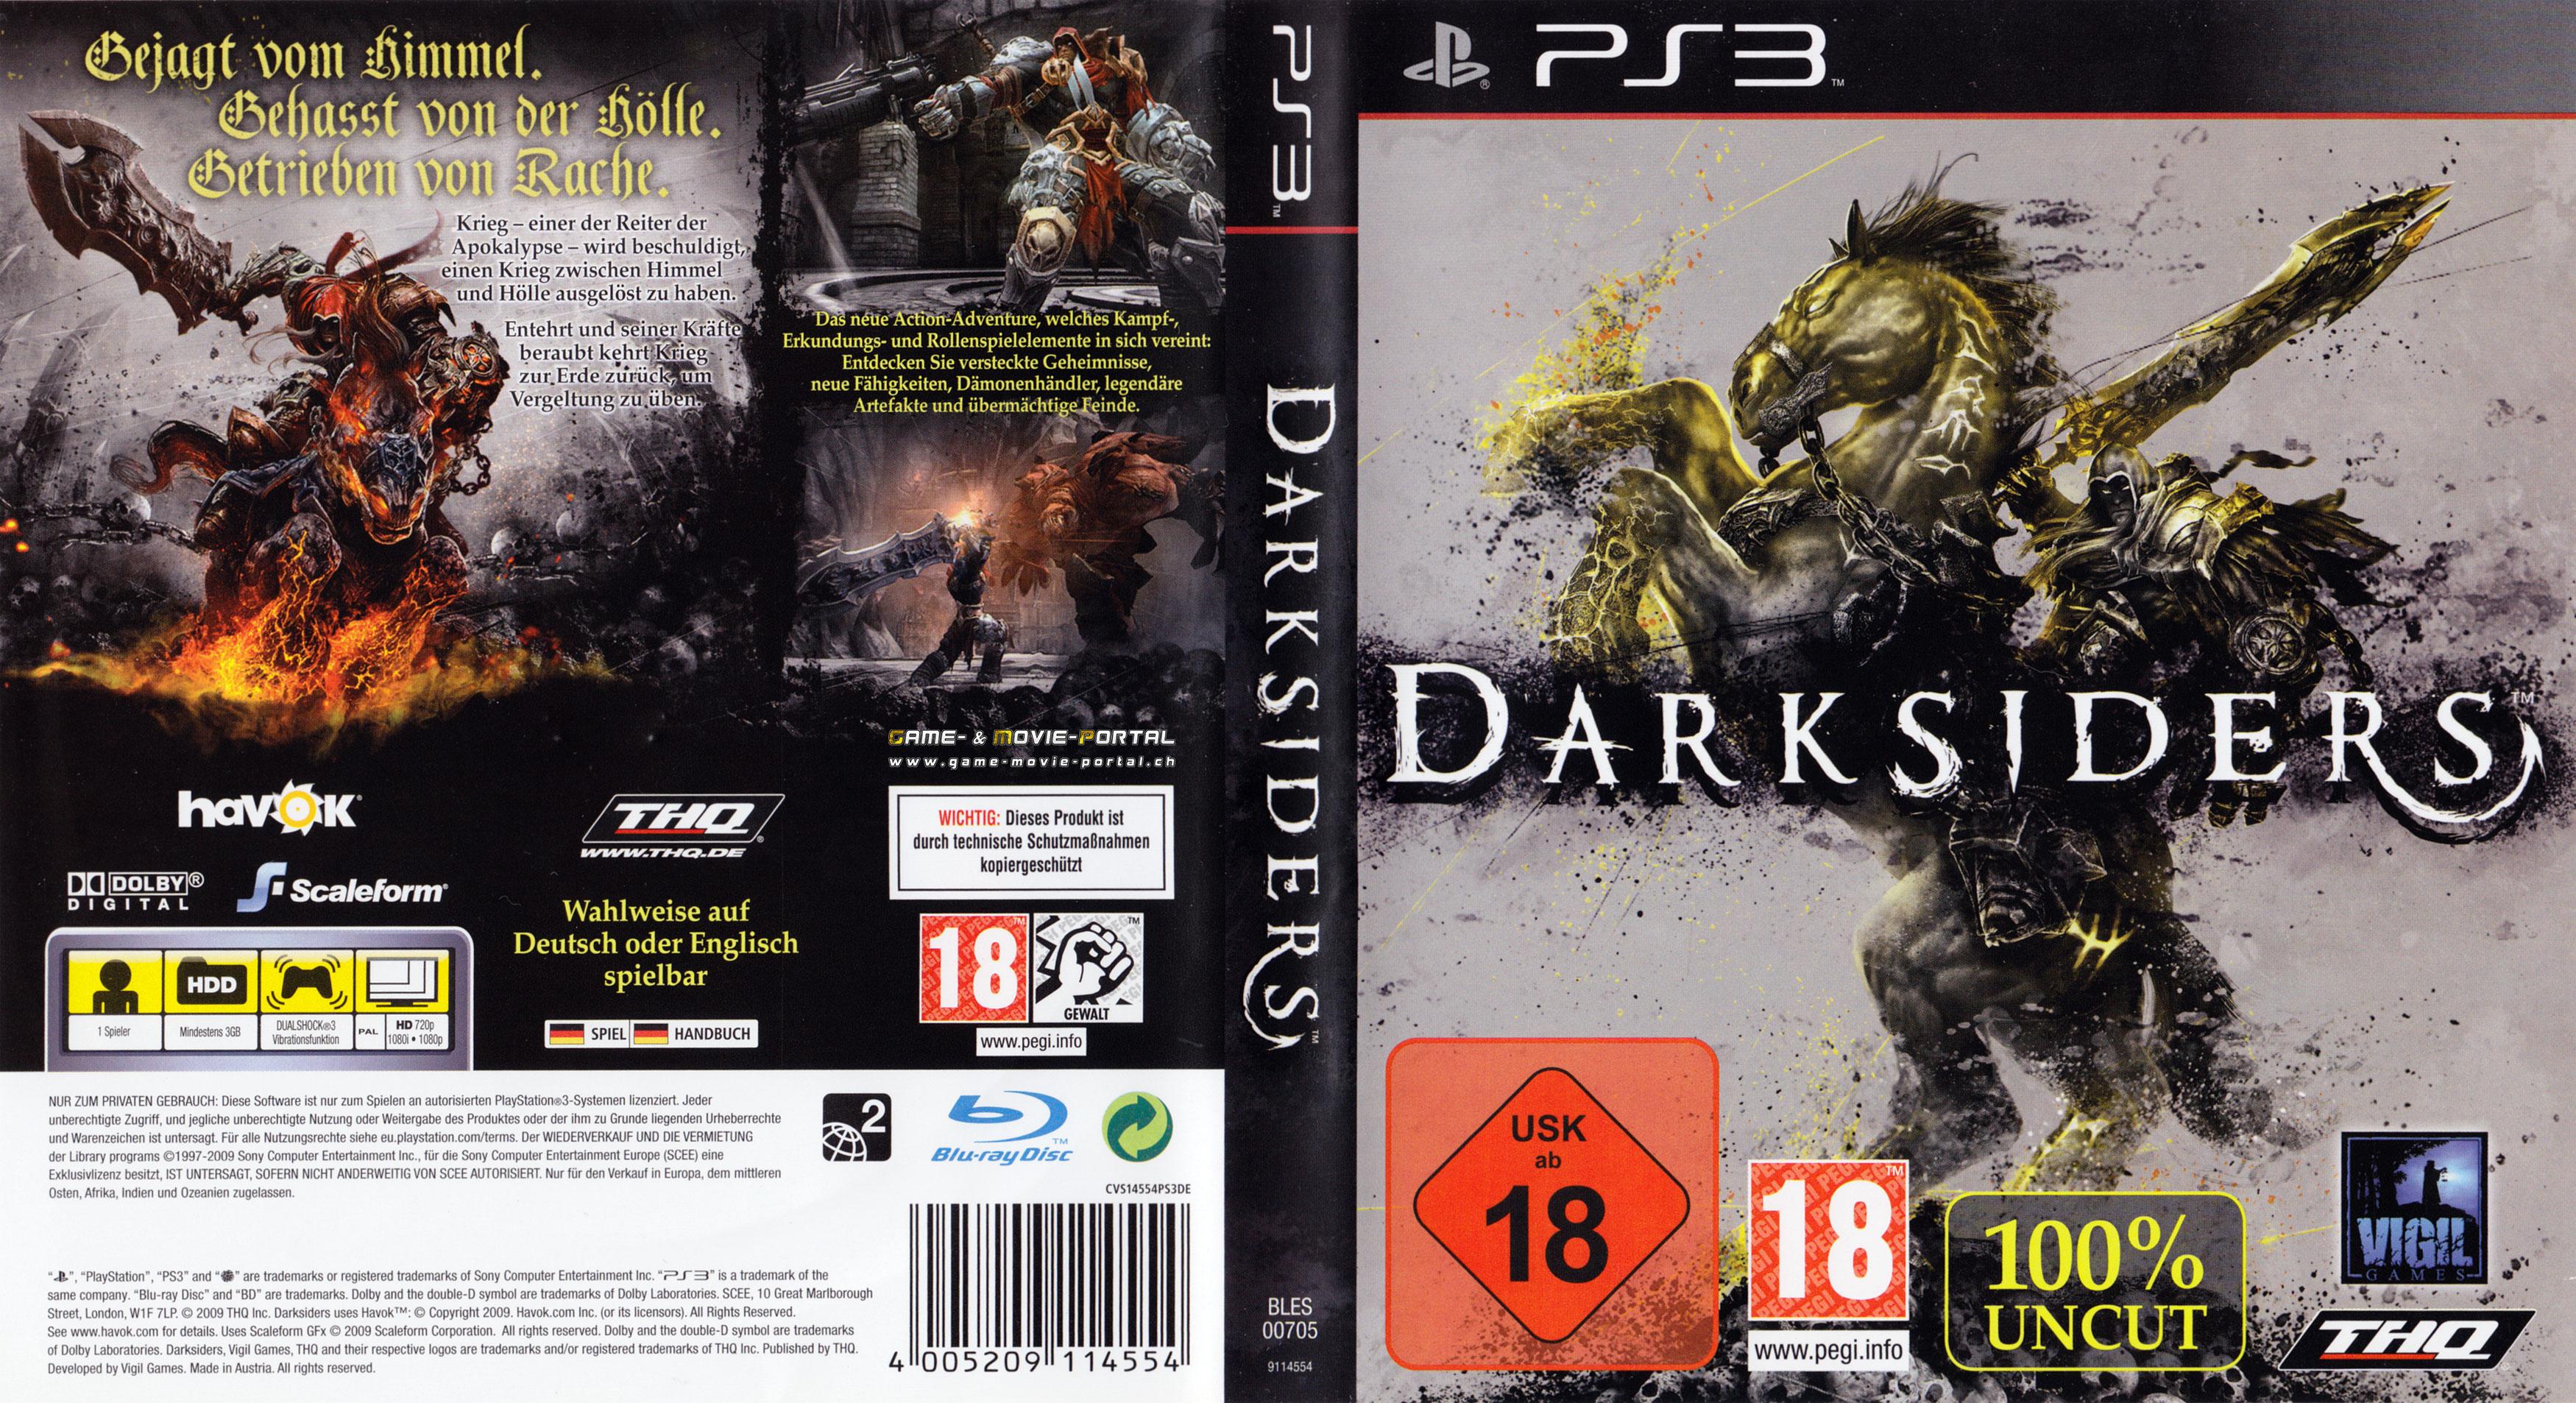 Playstation 3 Covers - Dantes Inferno, Dark Souls, Darksiders, Dead